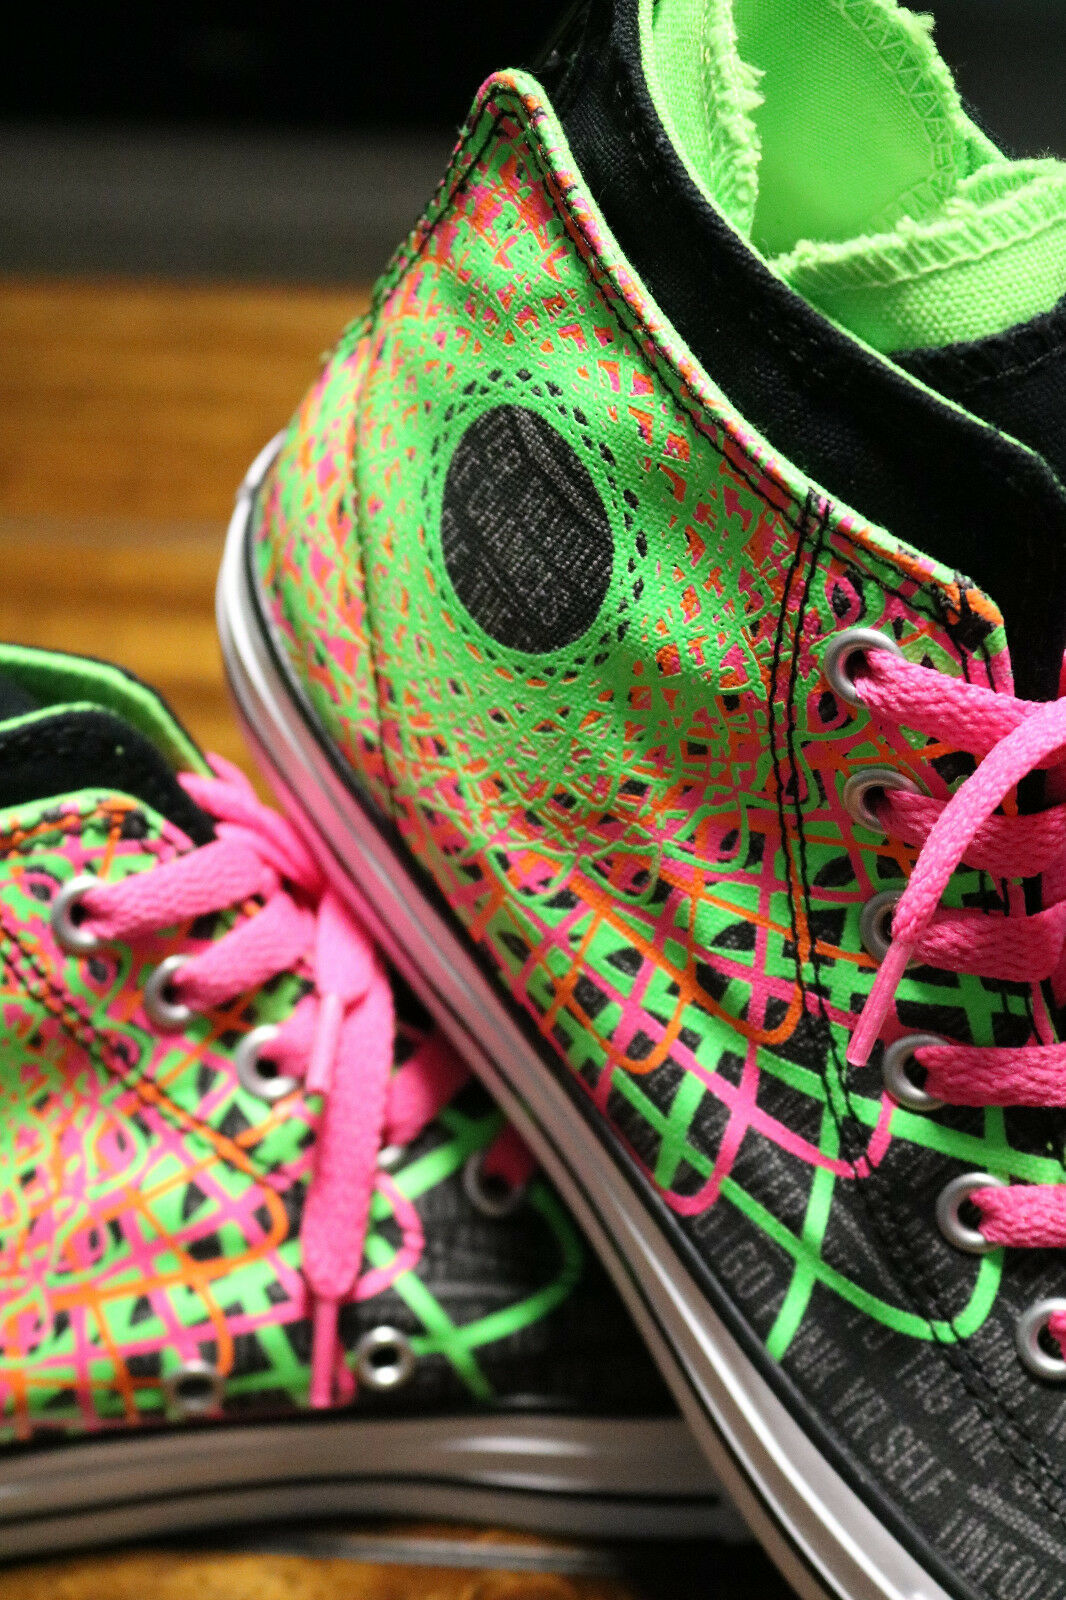 Converse Chuck Taylor All Star Zipback 649963C Black Pink Green Shoes Girls Sz 5 image 10